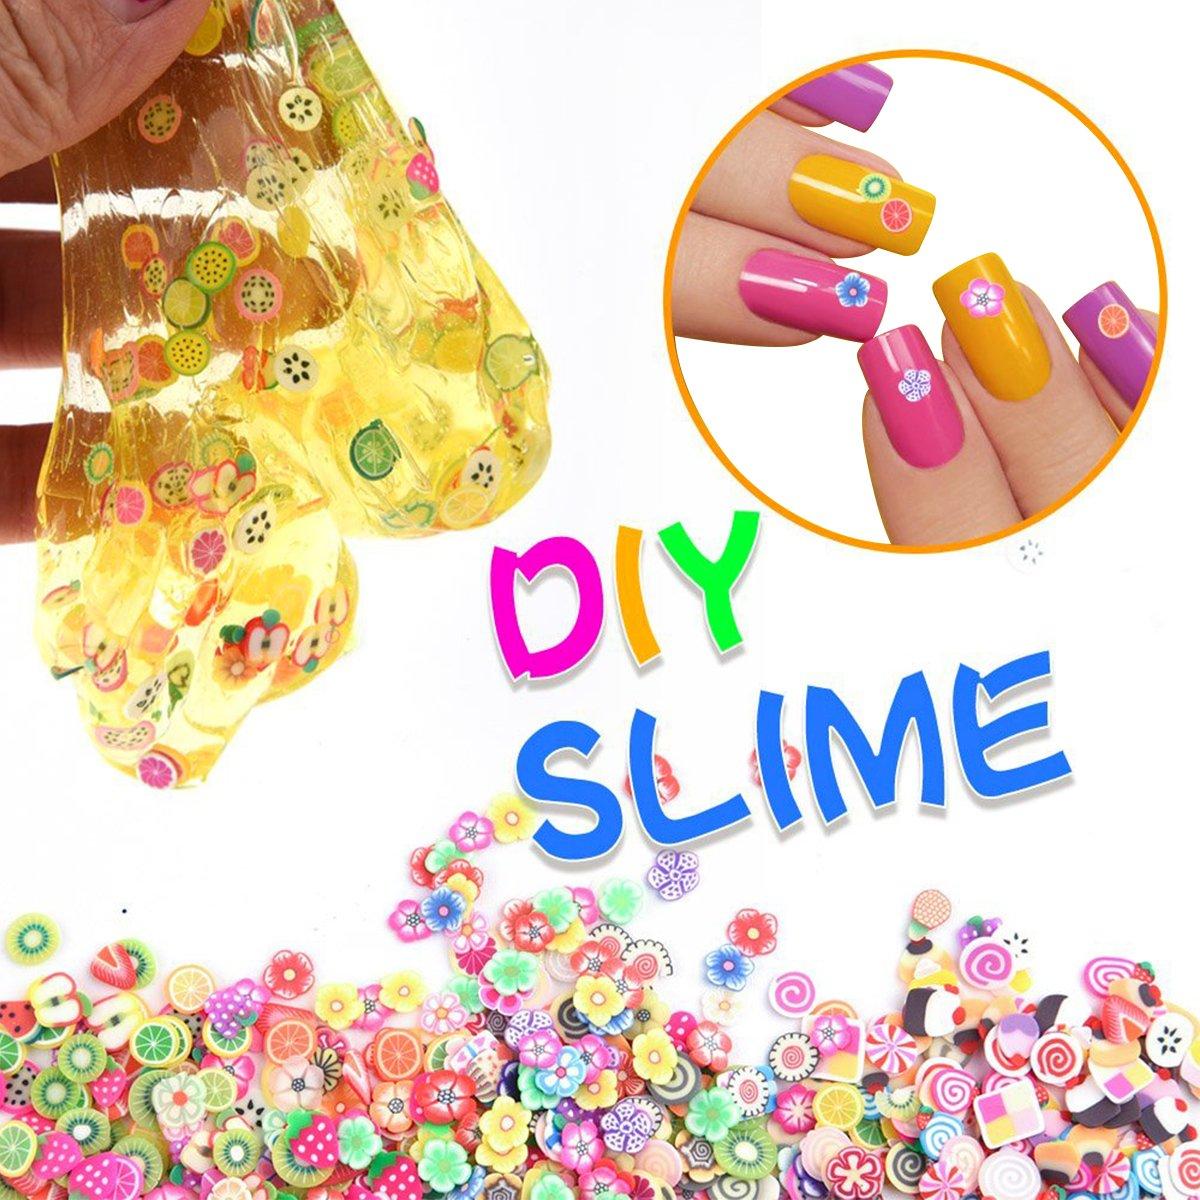 Novata Slime 36 Pack de Suministros para Bricolaje Manualidades, Incluye Espuma abalorio, Cuentas peceras, tarros de Glitter, rodajas de Frutas ect.para ...